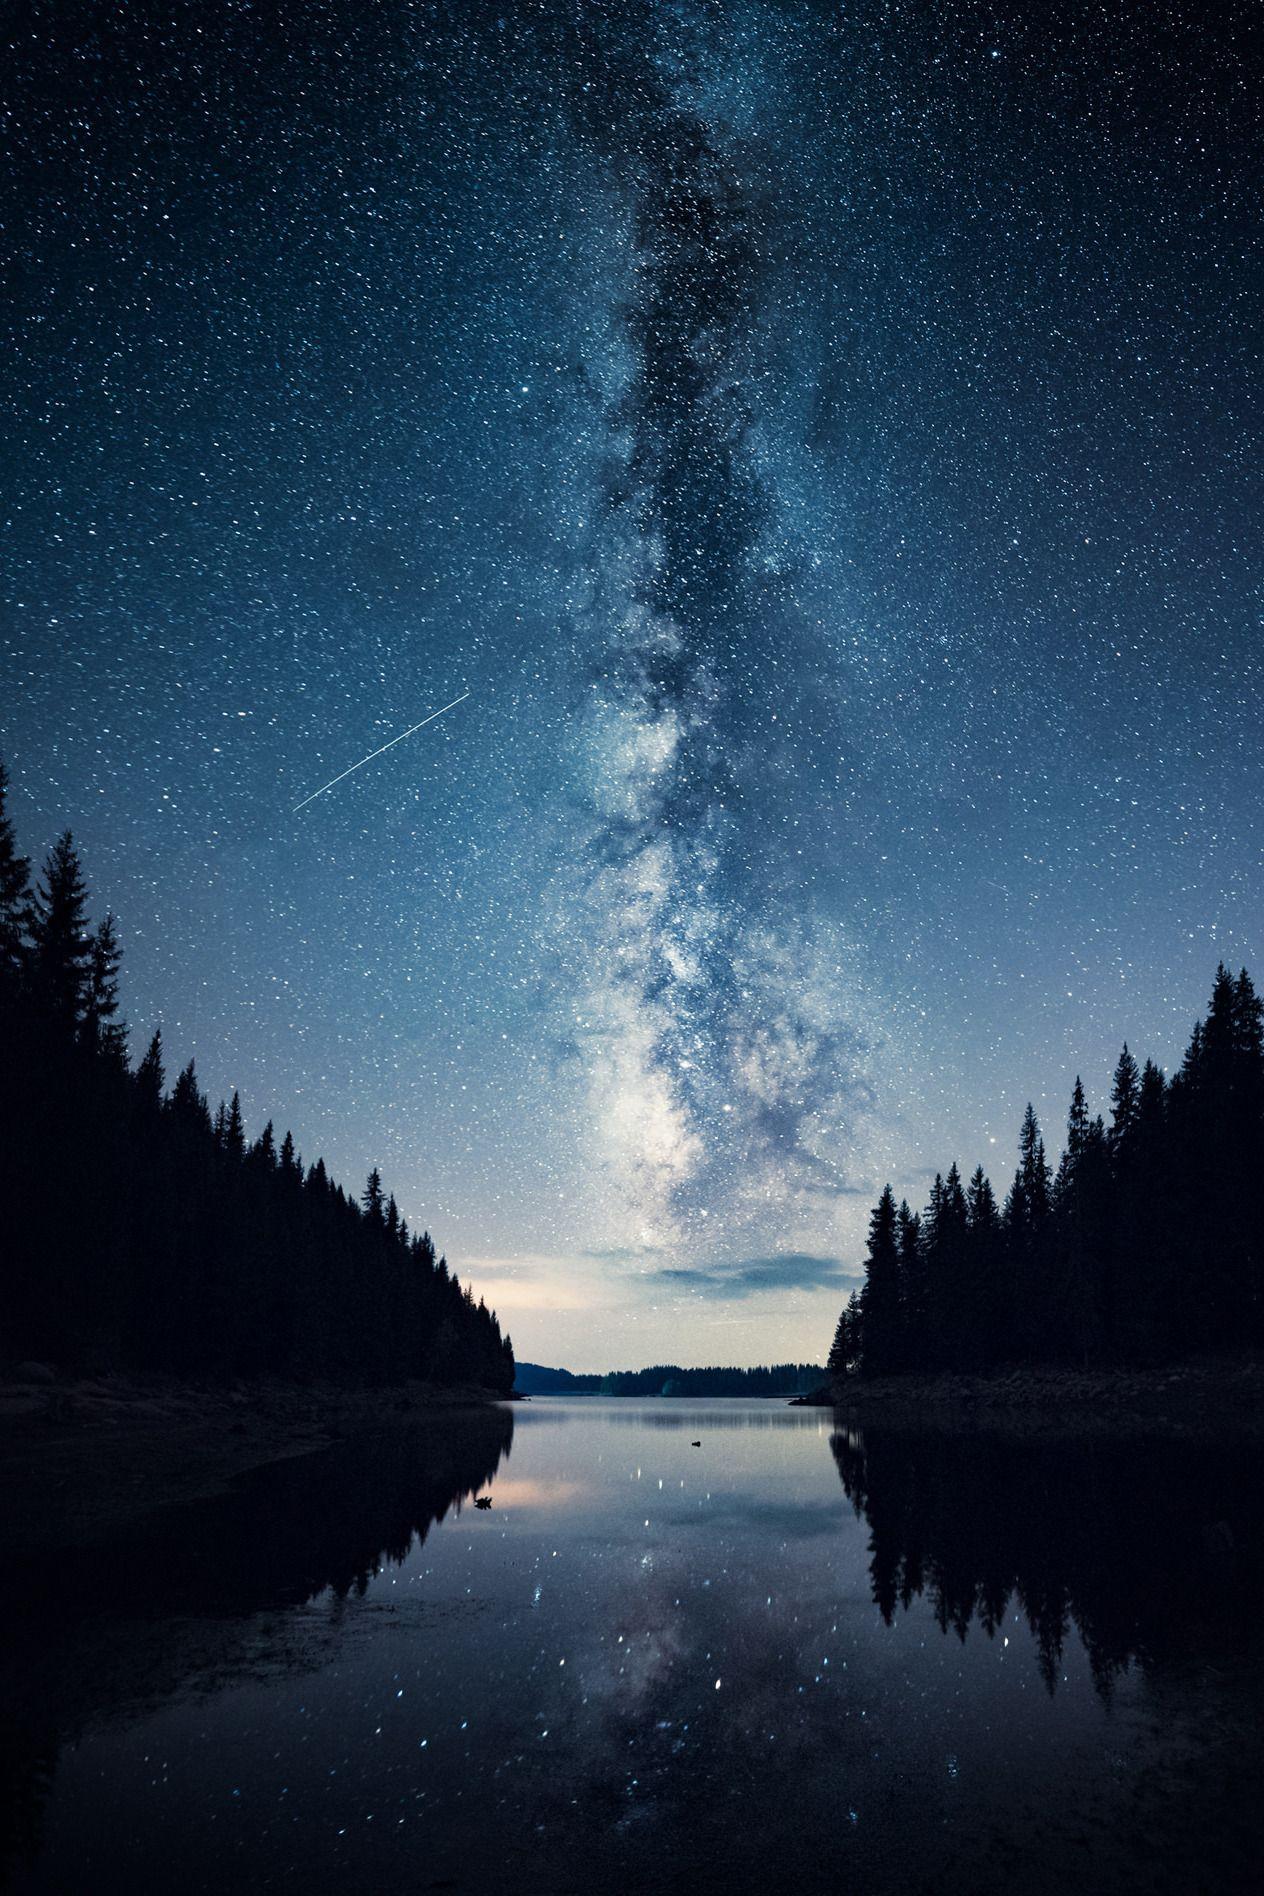 Night Skies Scenery Photography World Photography Photography Awards Creative Photography Planets